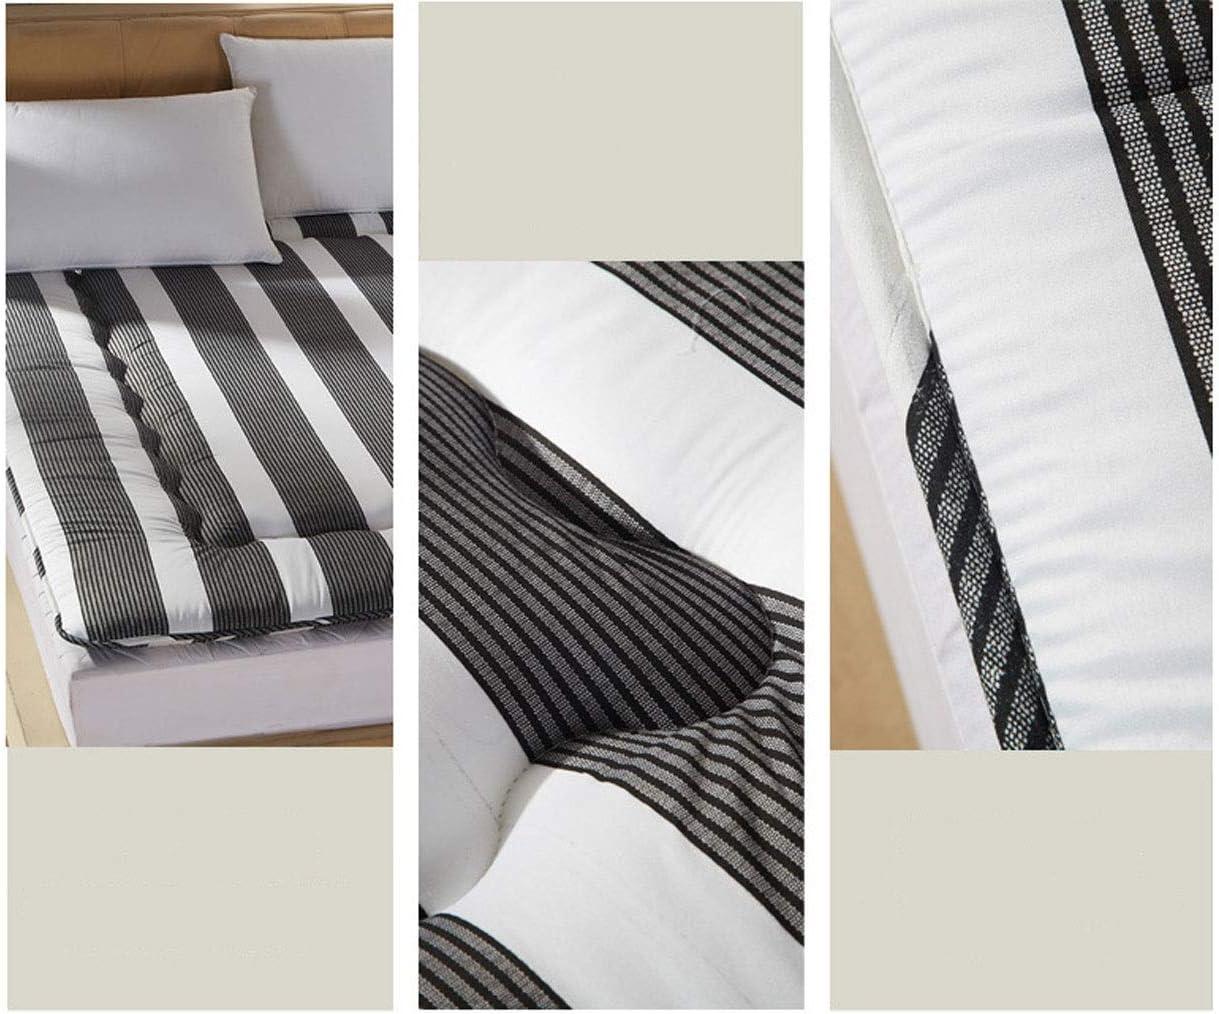 HMDJW Futon Tatami Cushion Matelas, Tapis de Sol, Surmatelas Coussin (Color : B120*200cm) A180*200 Cm